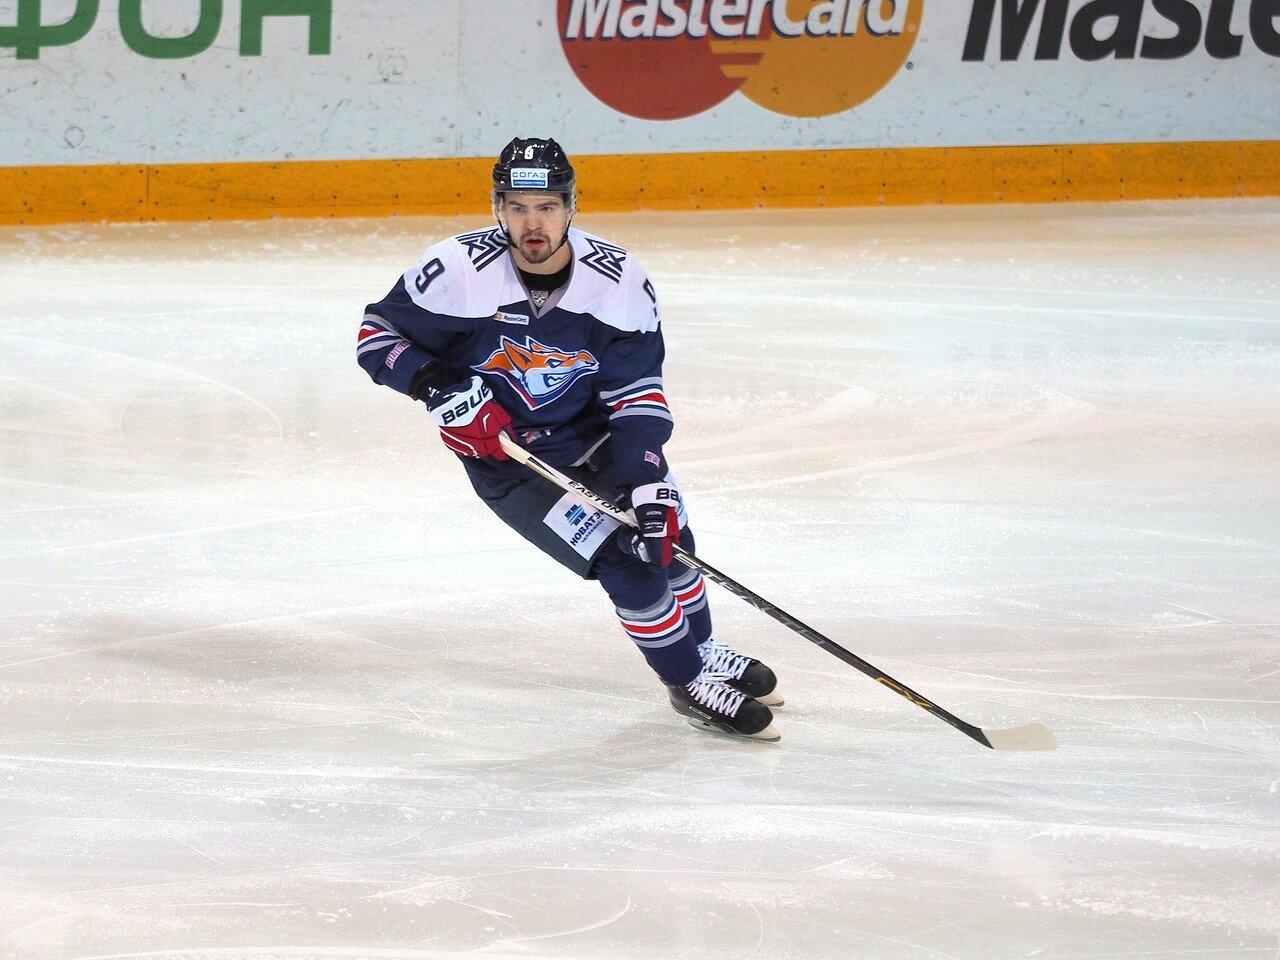 115Плей-офф 2016 Восток Финал Металлург - Салават Юлаев 23.03.2016